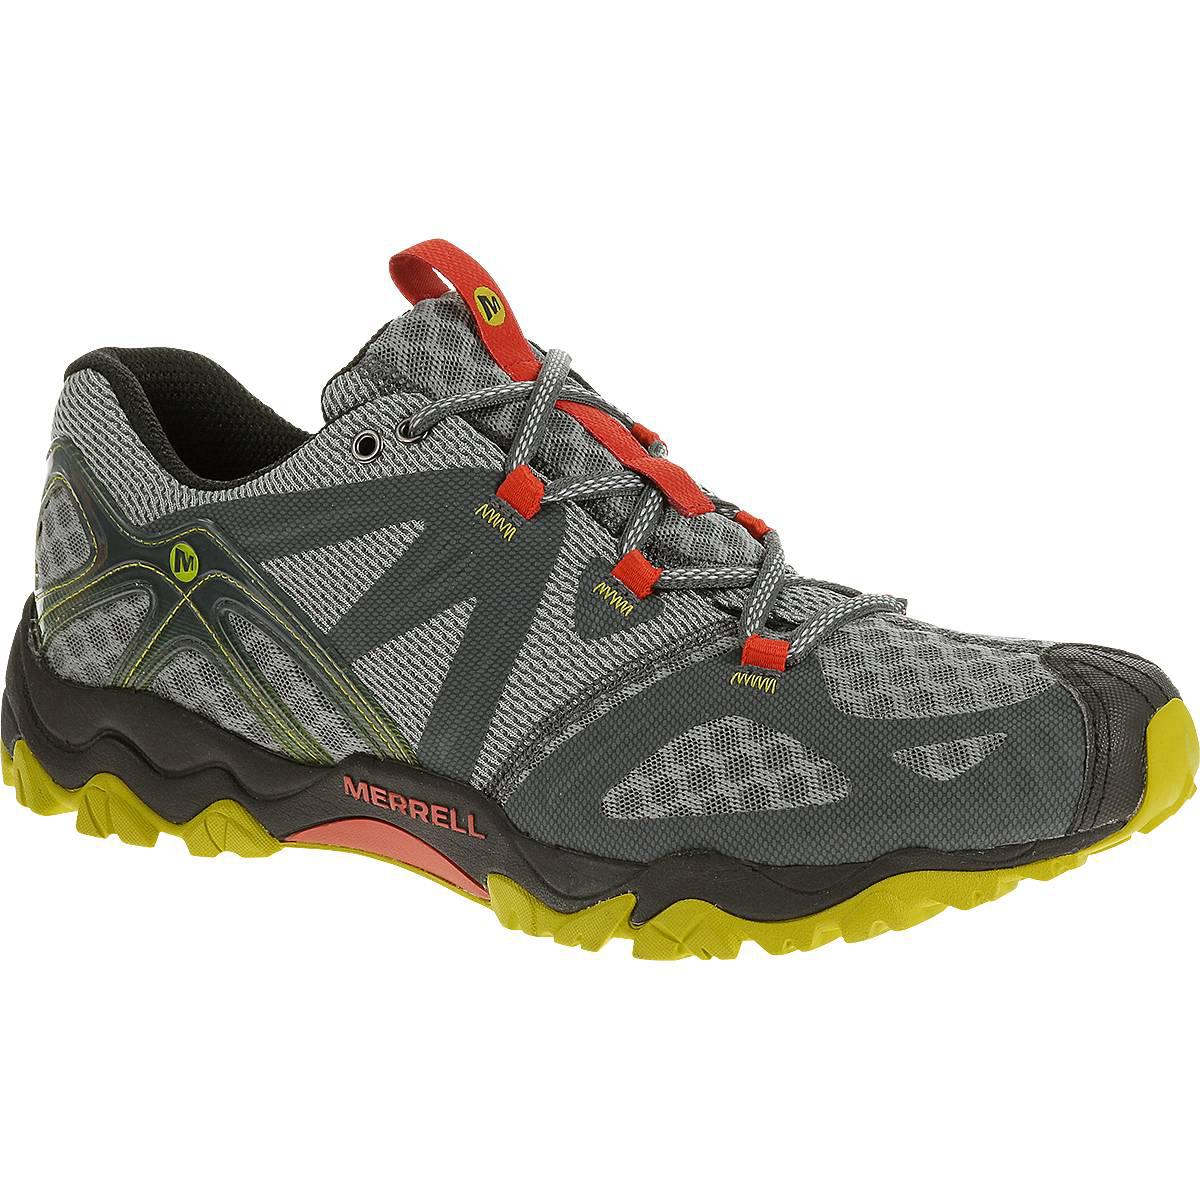 MERRELL Men's Grassbow Air Hiking Shoes